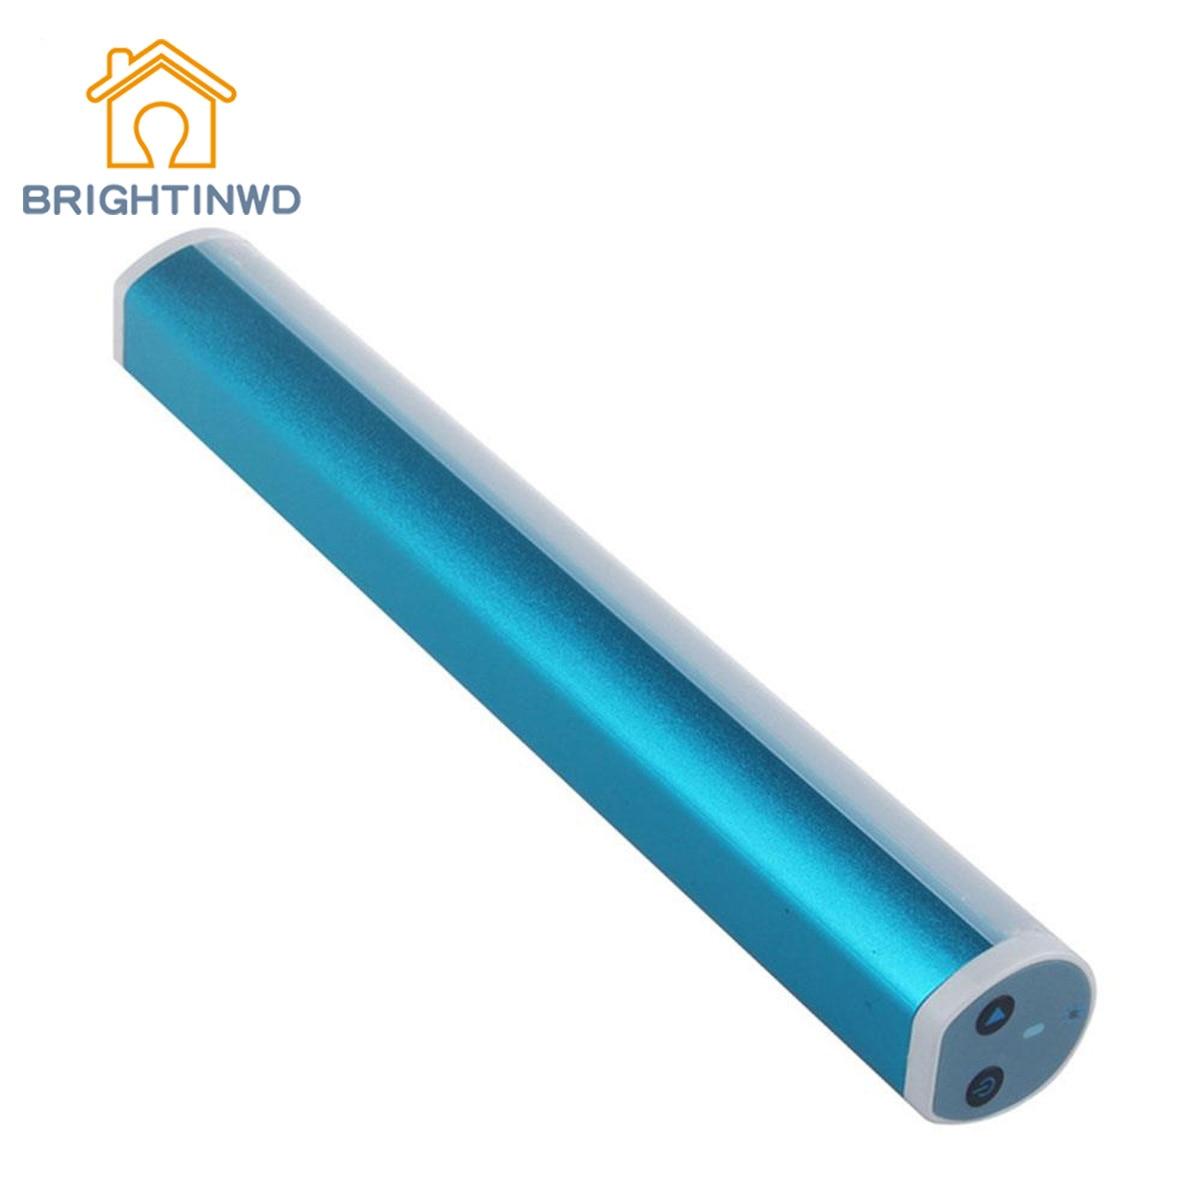 USB Charging Multicolor Portable Super Bright Power Bank Flashlight Camping Lights Light Bulb Emergency Light Fishing Tent Lamp